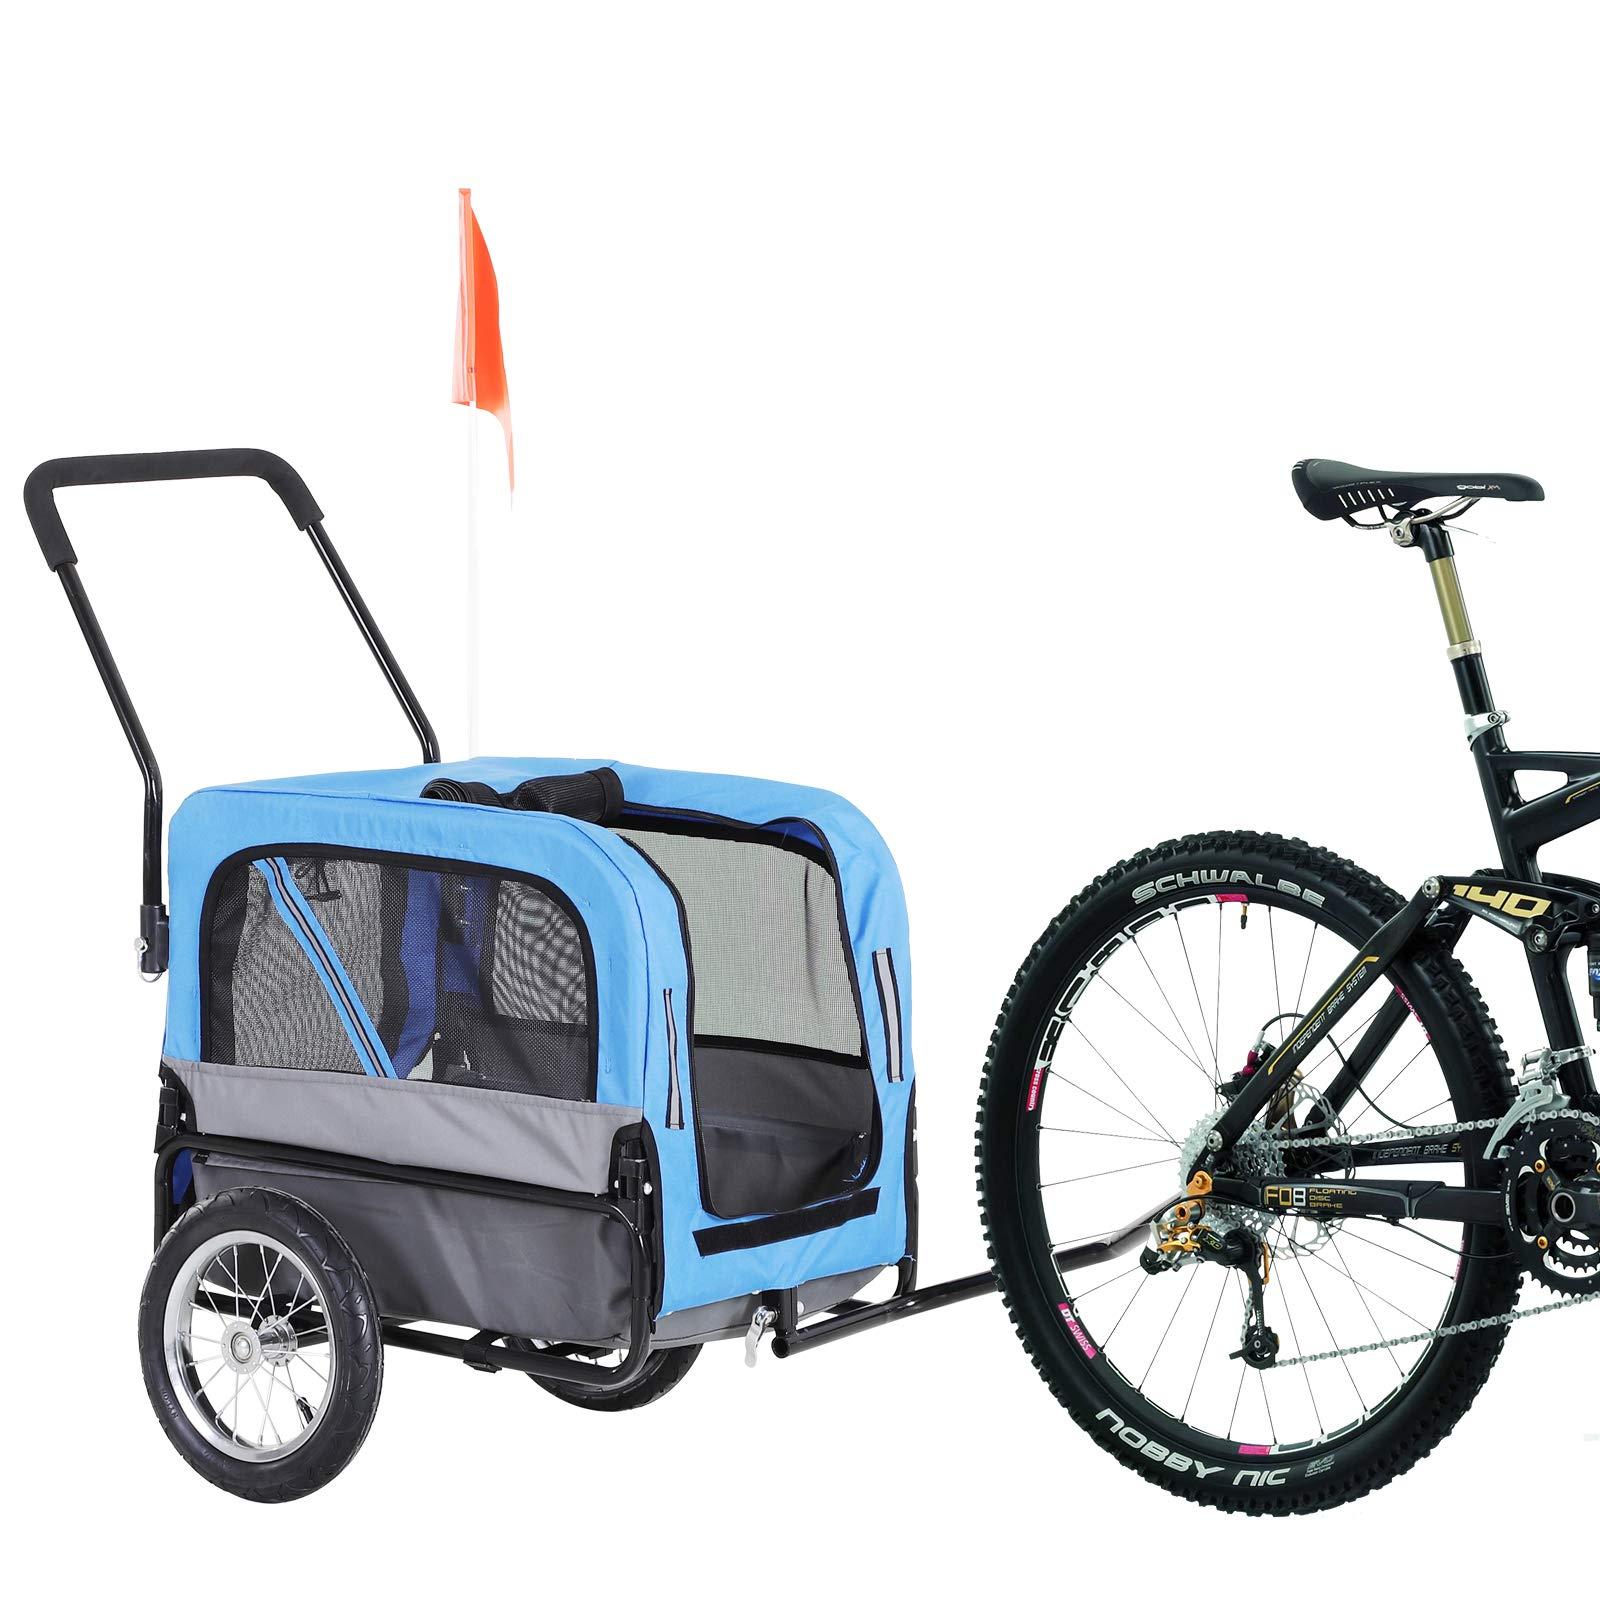 Aosom Elite-Jr 2-in-1 Dog Pet Bicycle Trailer/Stroller with Swivel Wheel - Blue/Black by Aosom